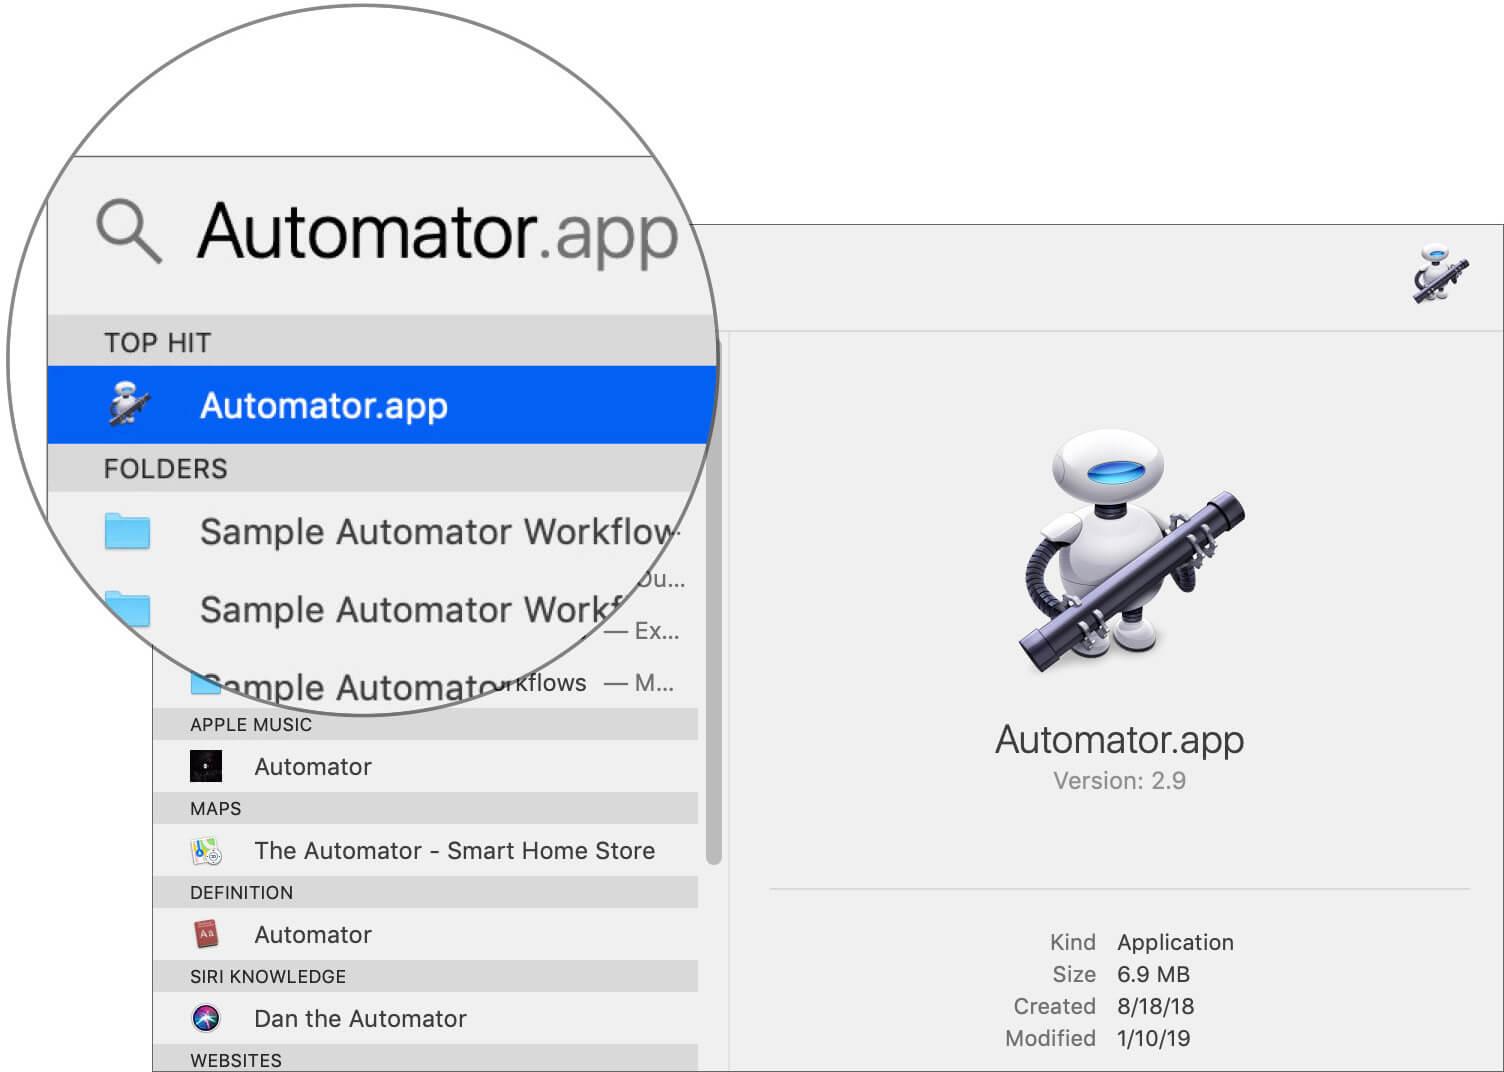 Open Automator app using Spotlight Search on Mac